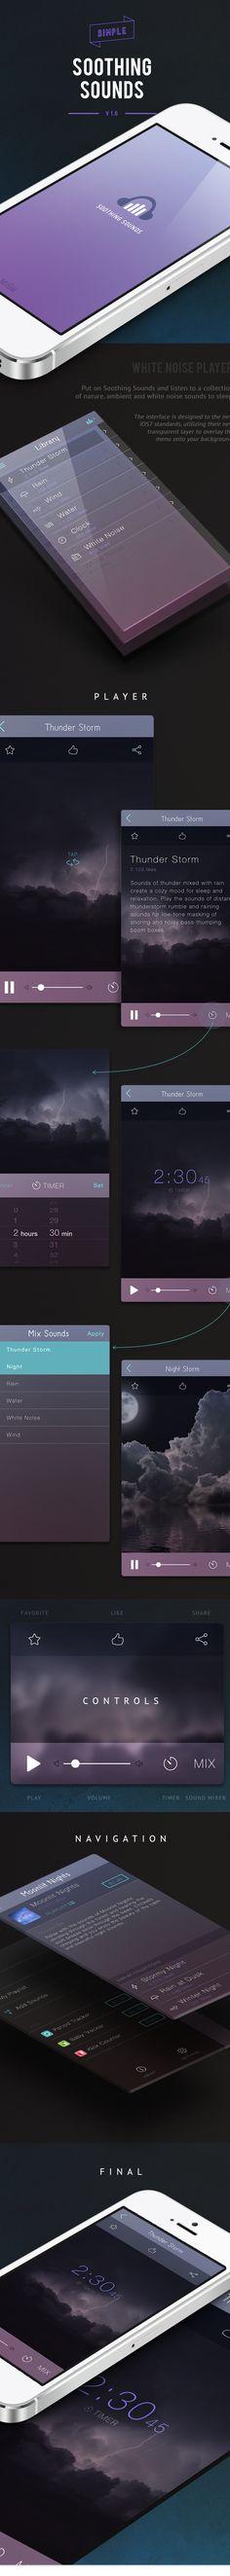 Soothing Sounds - iPhone App by Dianna Su, via Behance Mobile Ui Design, App Ui Design, User Interface Design, Web Design, Application Design, Mobile Application, Desktop Design, Tablet Ui, Mobile App Ui